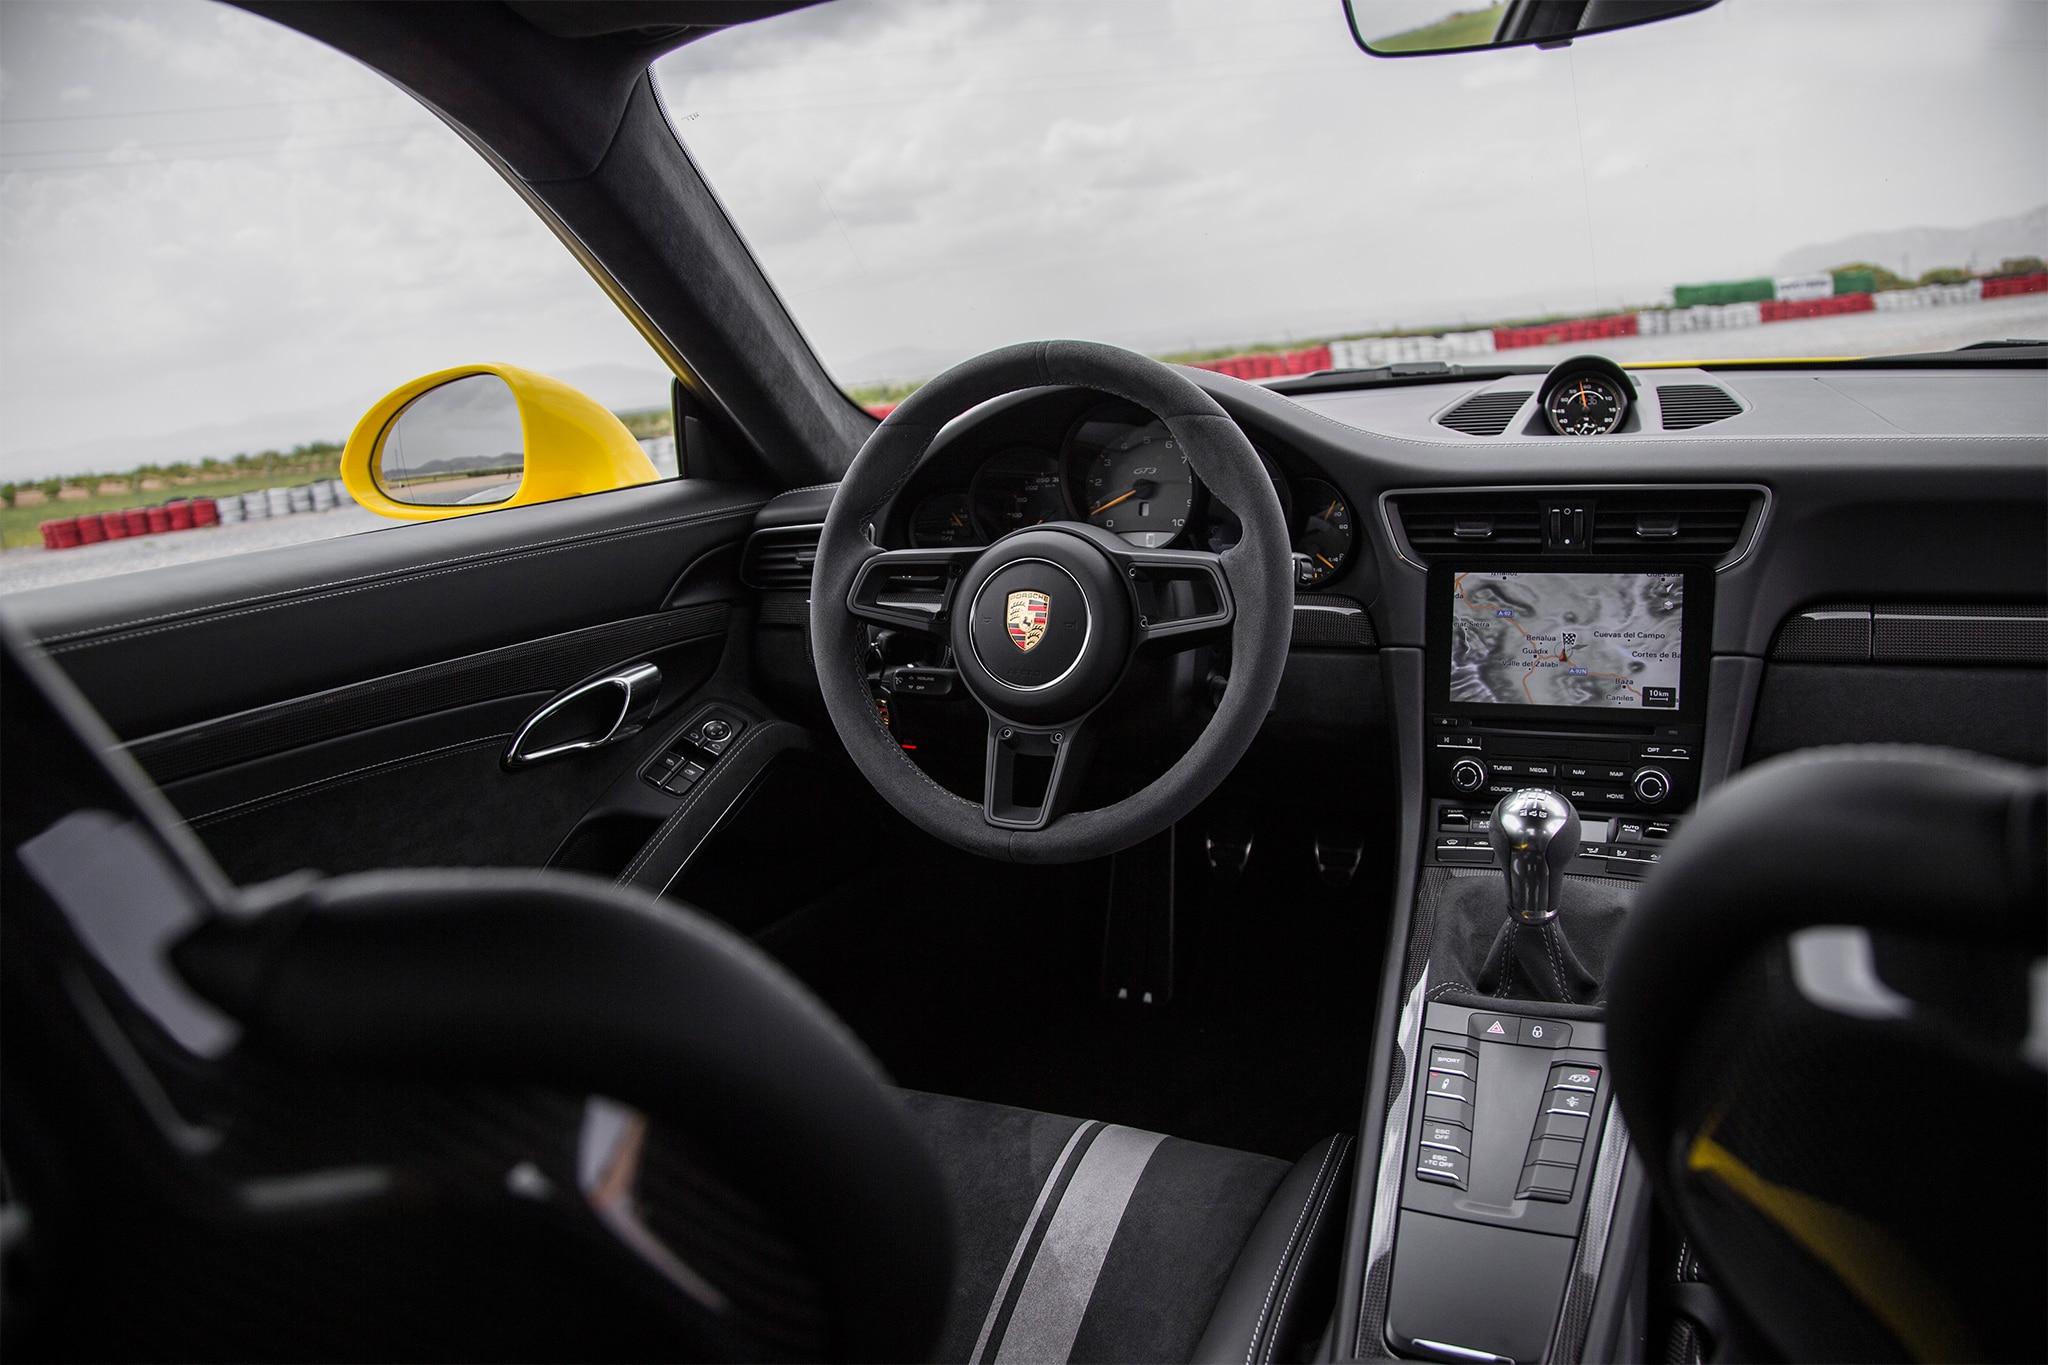 2018 porsche 911 gt3 first drive review automobile magazine. Black Bedroom Furniture Sets. Home Design Ideas